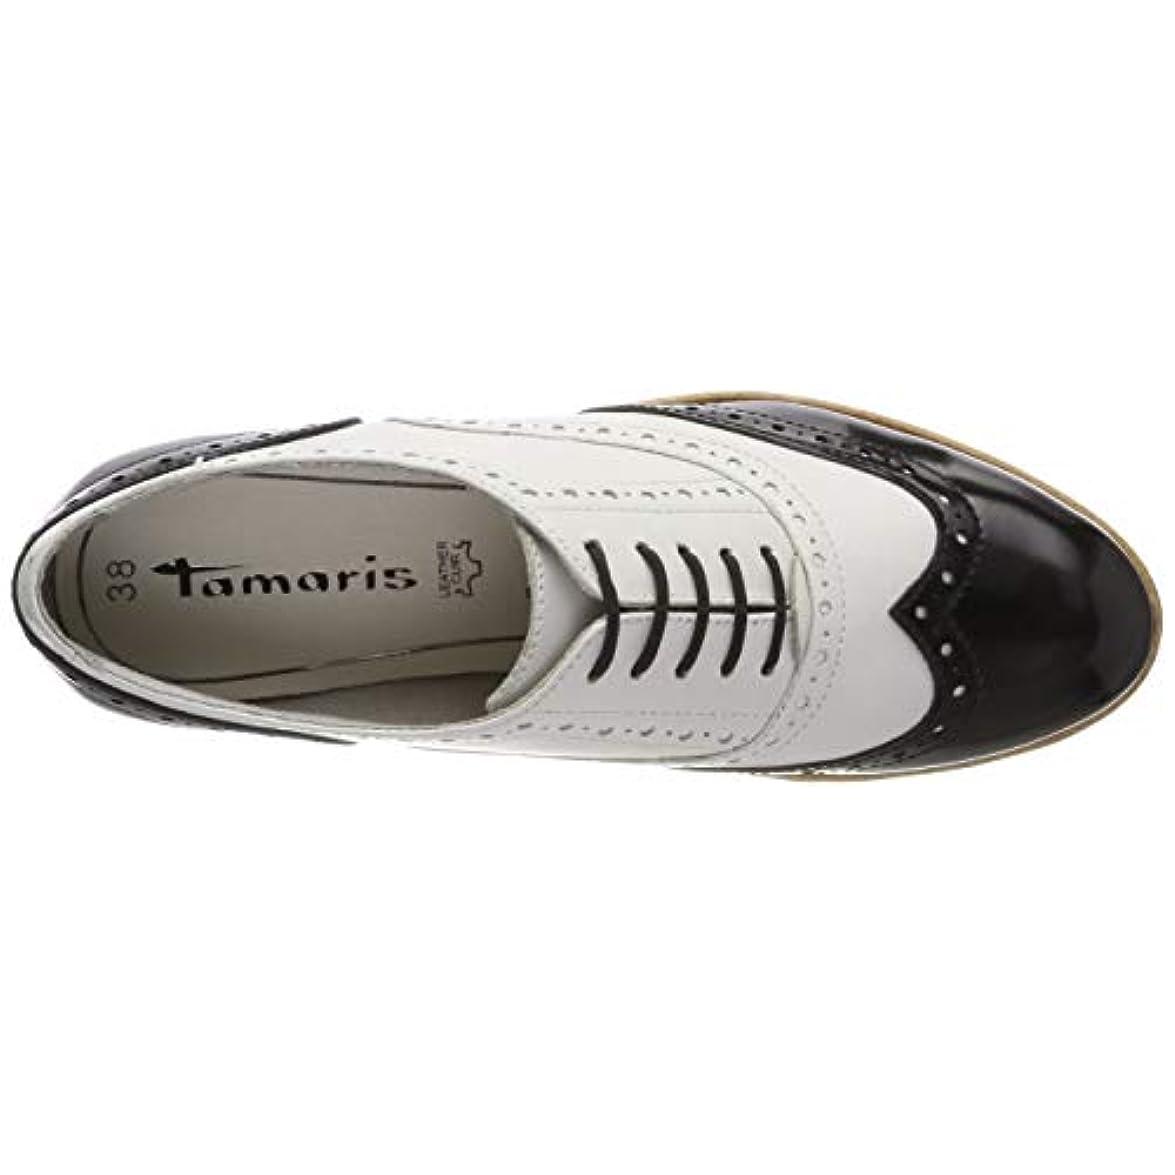 Tamaris 1-1-23717-22 125 Scarpe Da Ginnastica Basse Donna